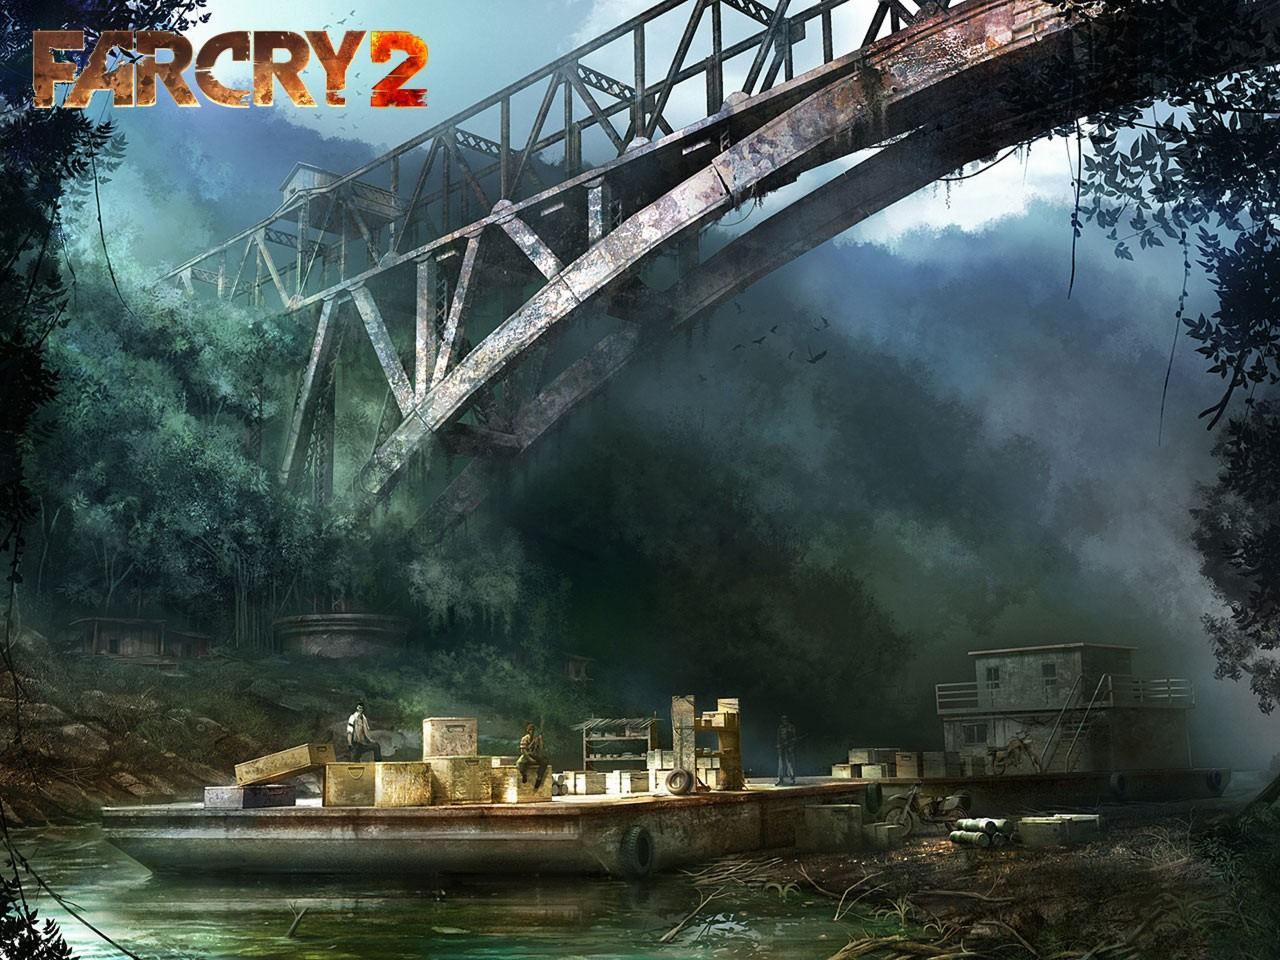 48+] Far Cry 2 Wallpaper on WallpaperSafari